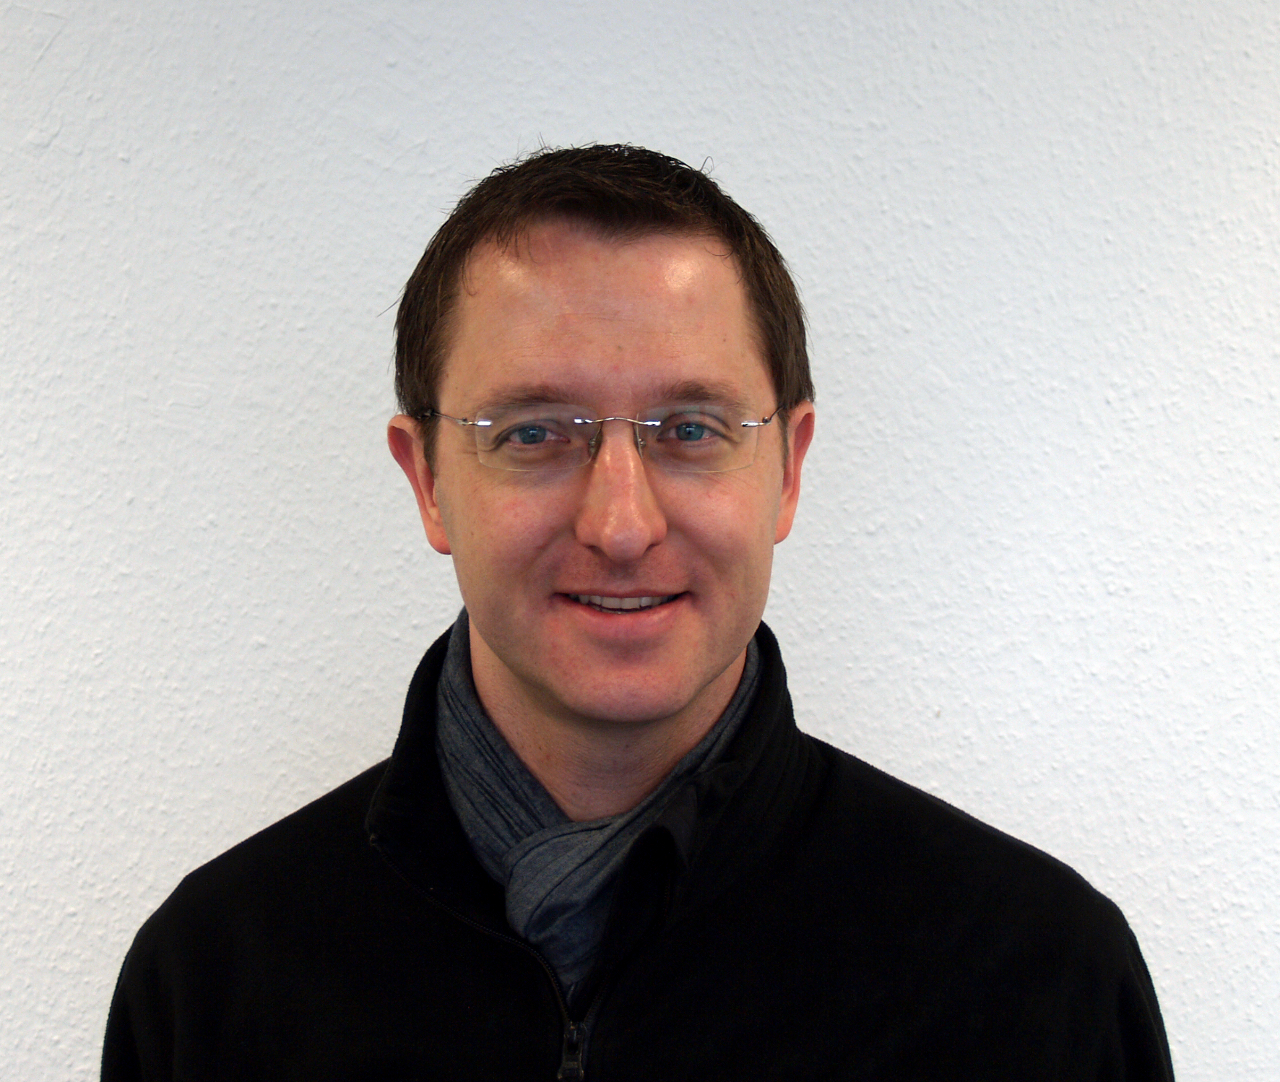 Carsten Leberecht